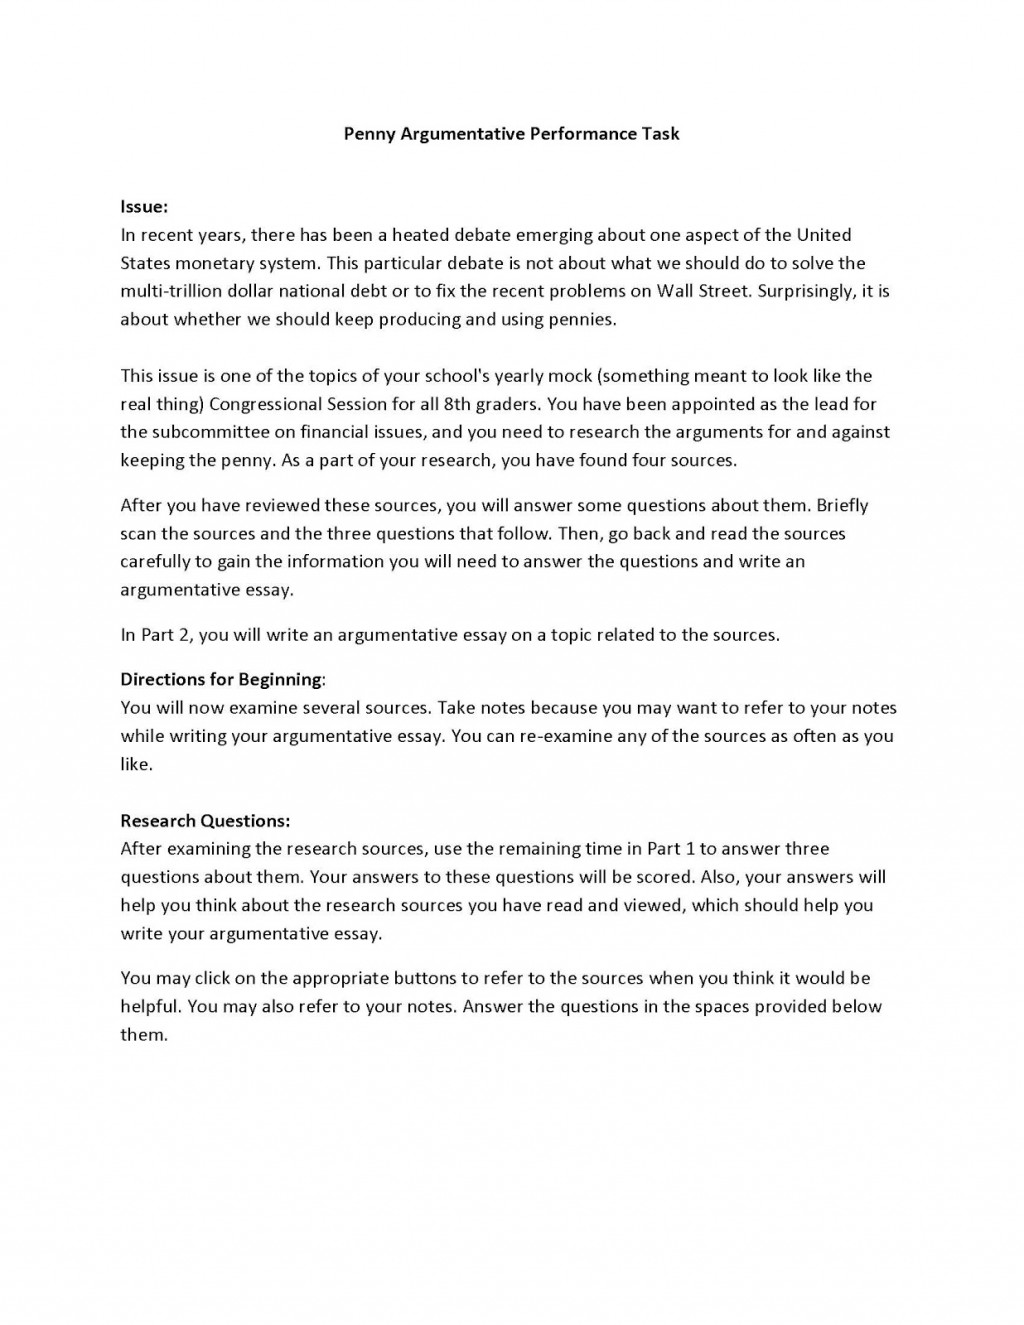 013 Death Penalty Essay Argumentative Essays On Of Argumentation Introduction Ljdbuiws8cqmm8eyorzbfjagydkosgefch8x57fxk67naismkfqlitegqbfawiqrnovq Persuasive Against Conclusion Awful Titles Outline Large